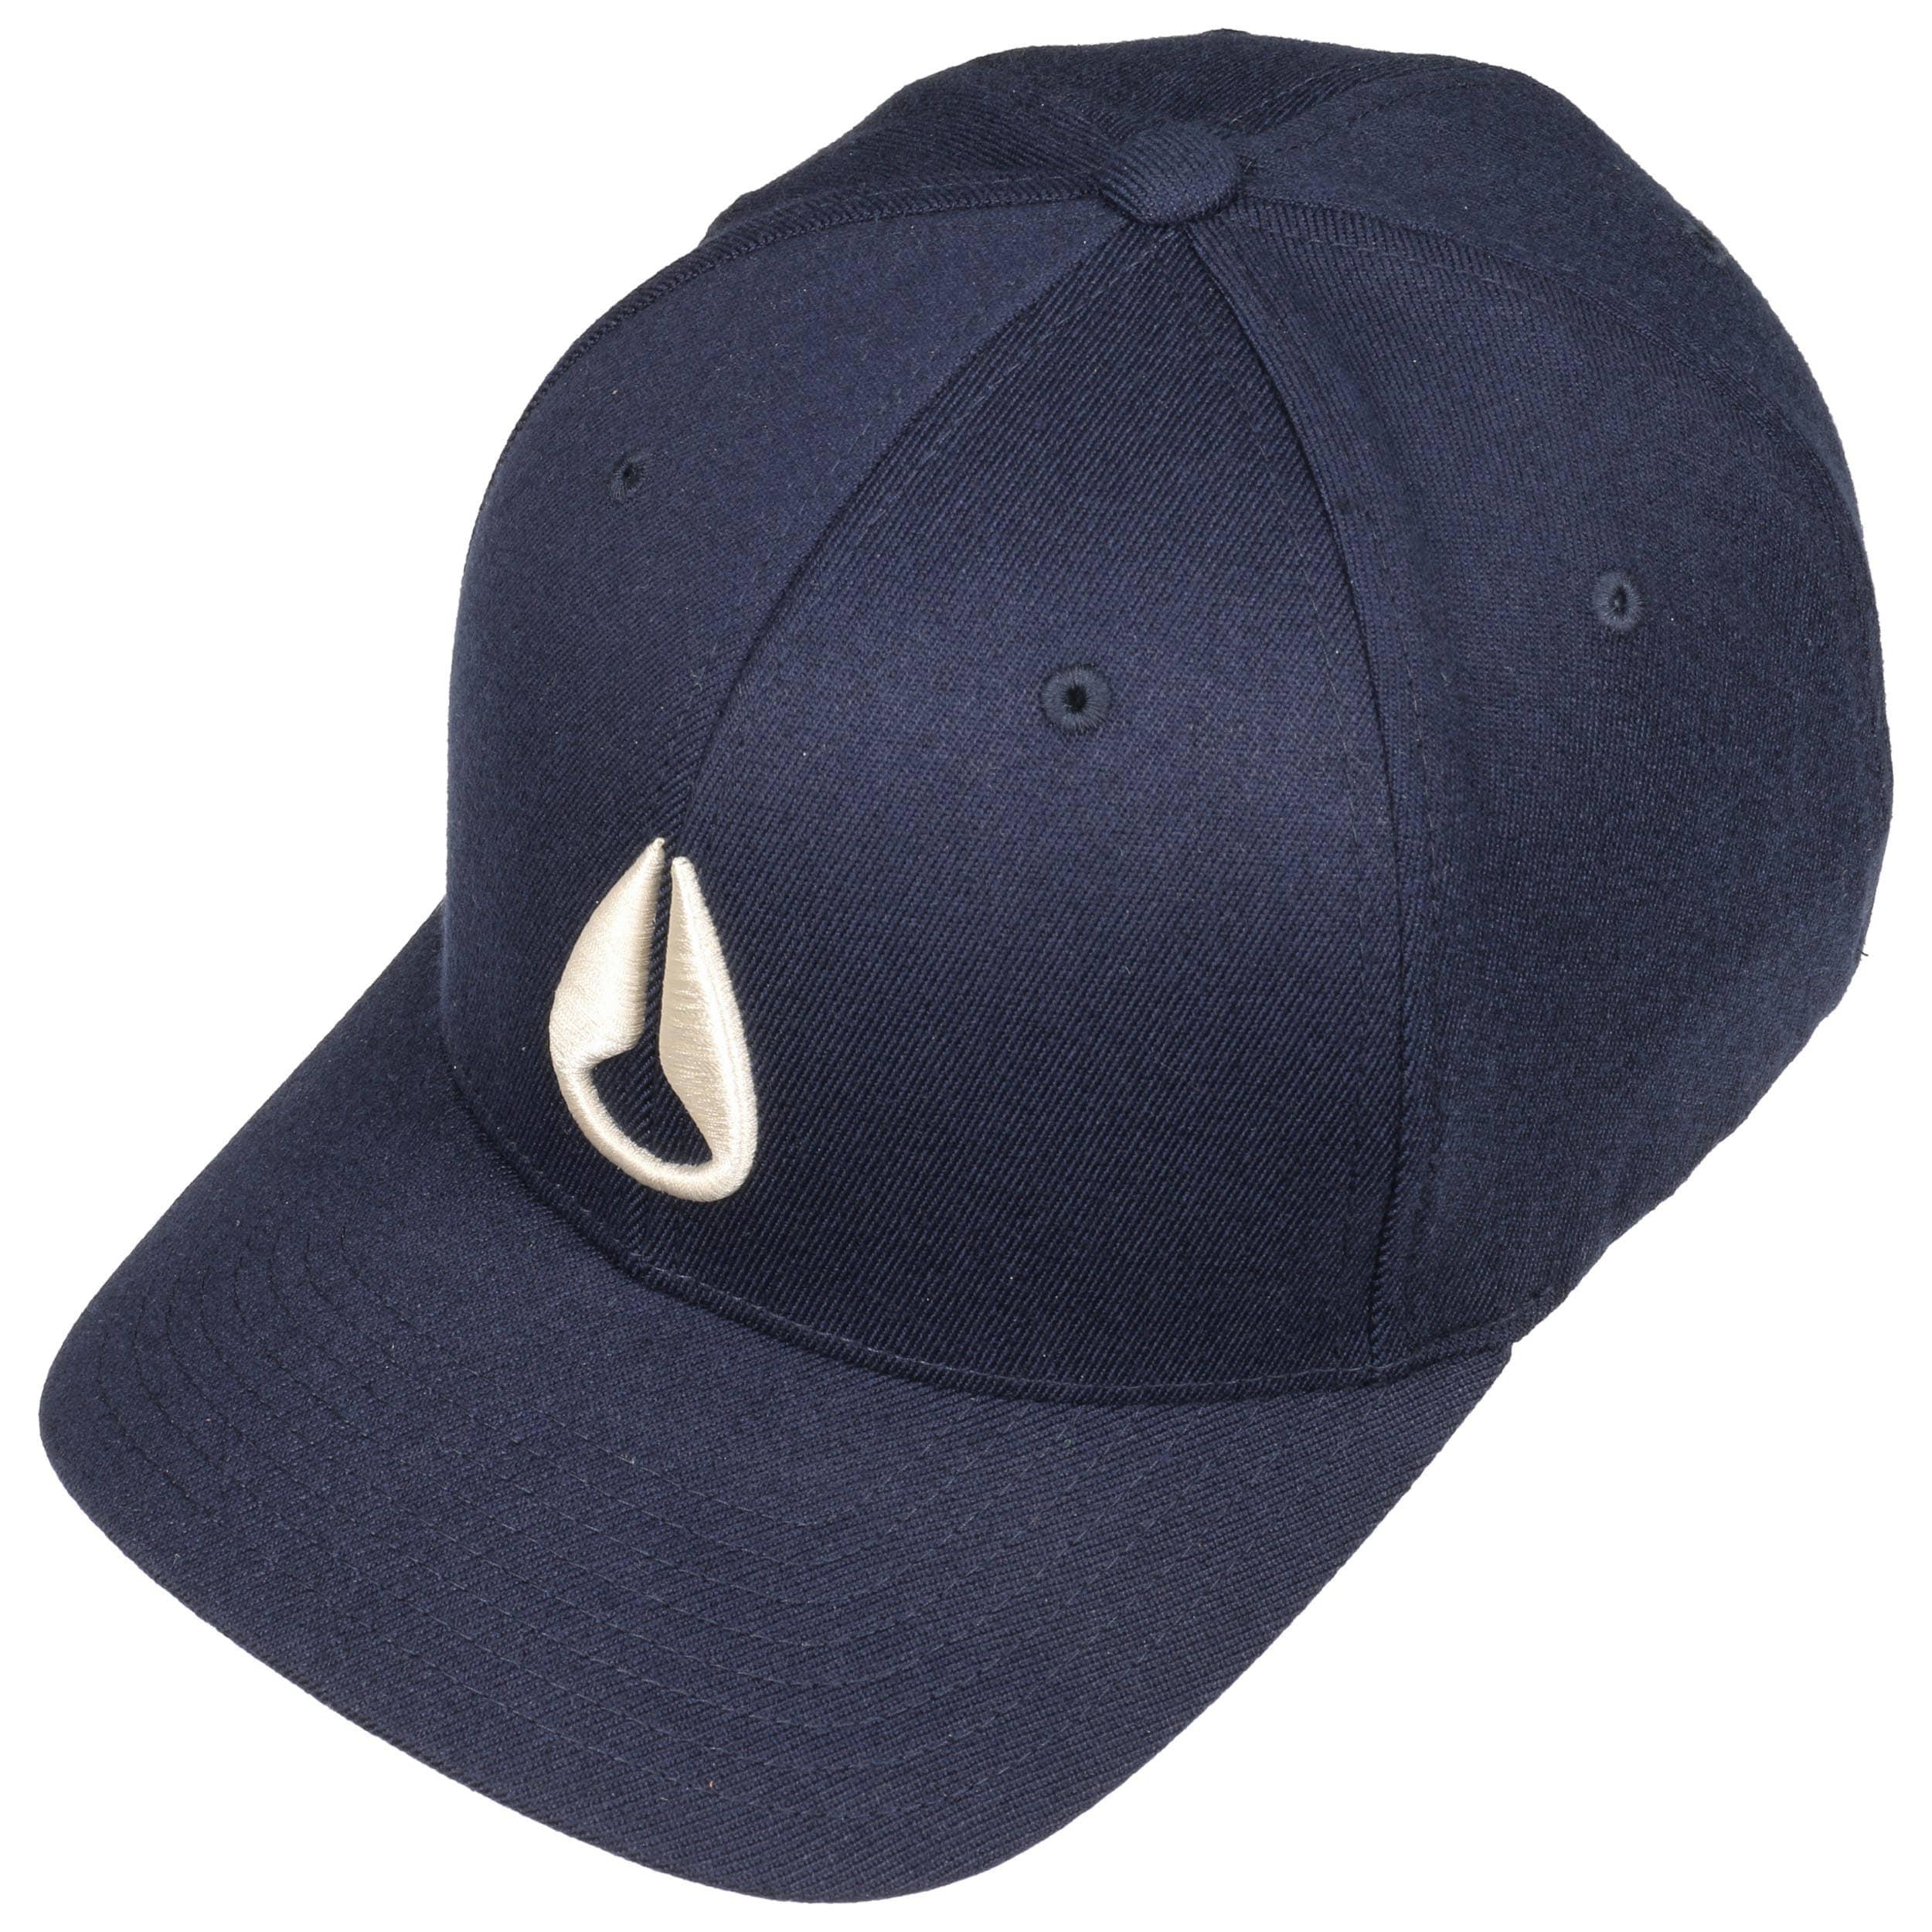 Gorra Deep Down Flexfit by Nixon - Gorras - sombreroshop.es b87268ccf23